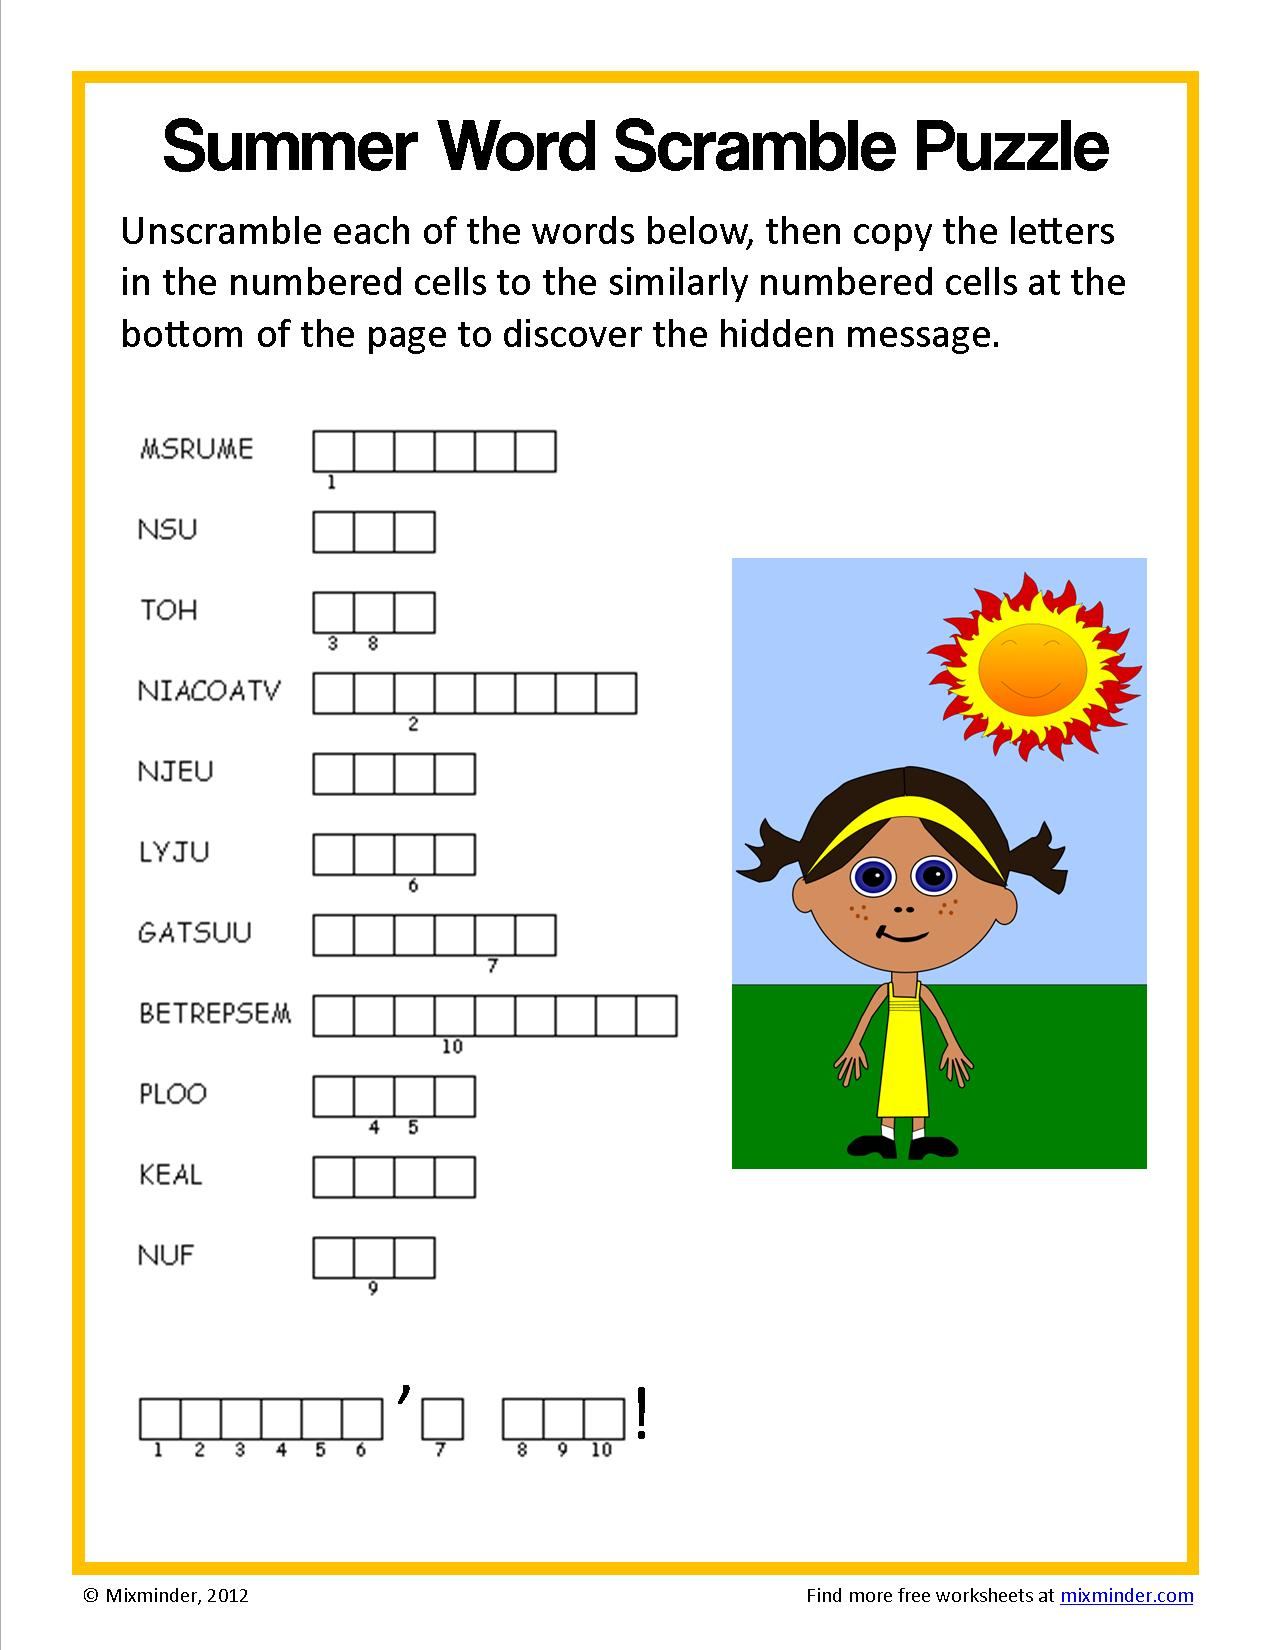 Summer Word Scramble Puzzle